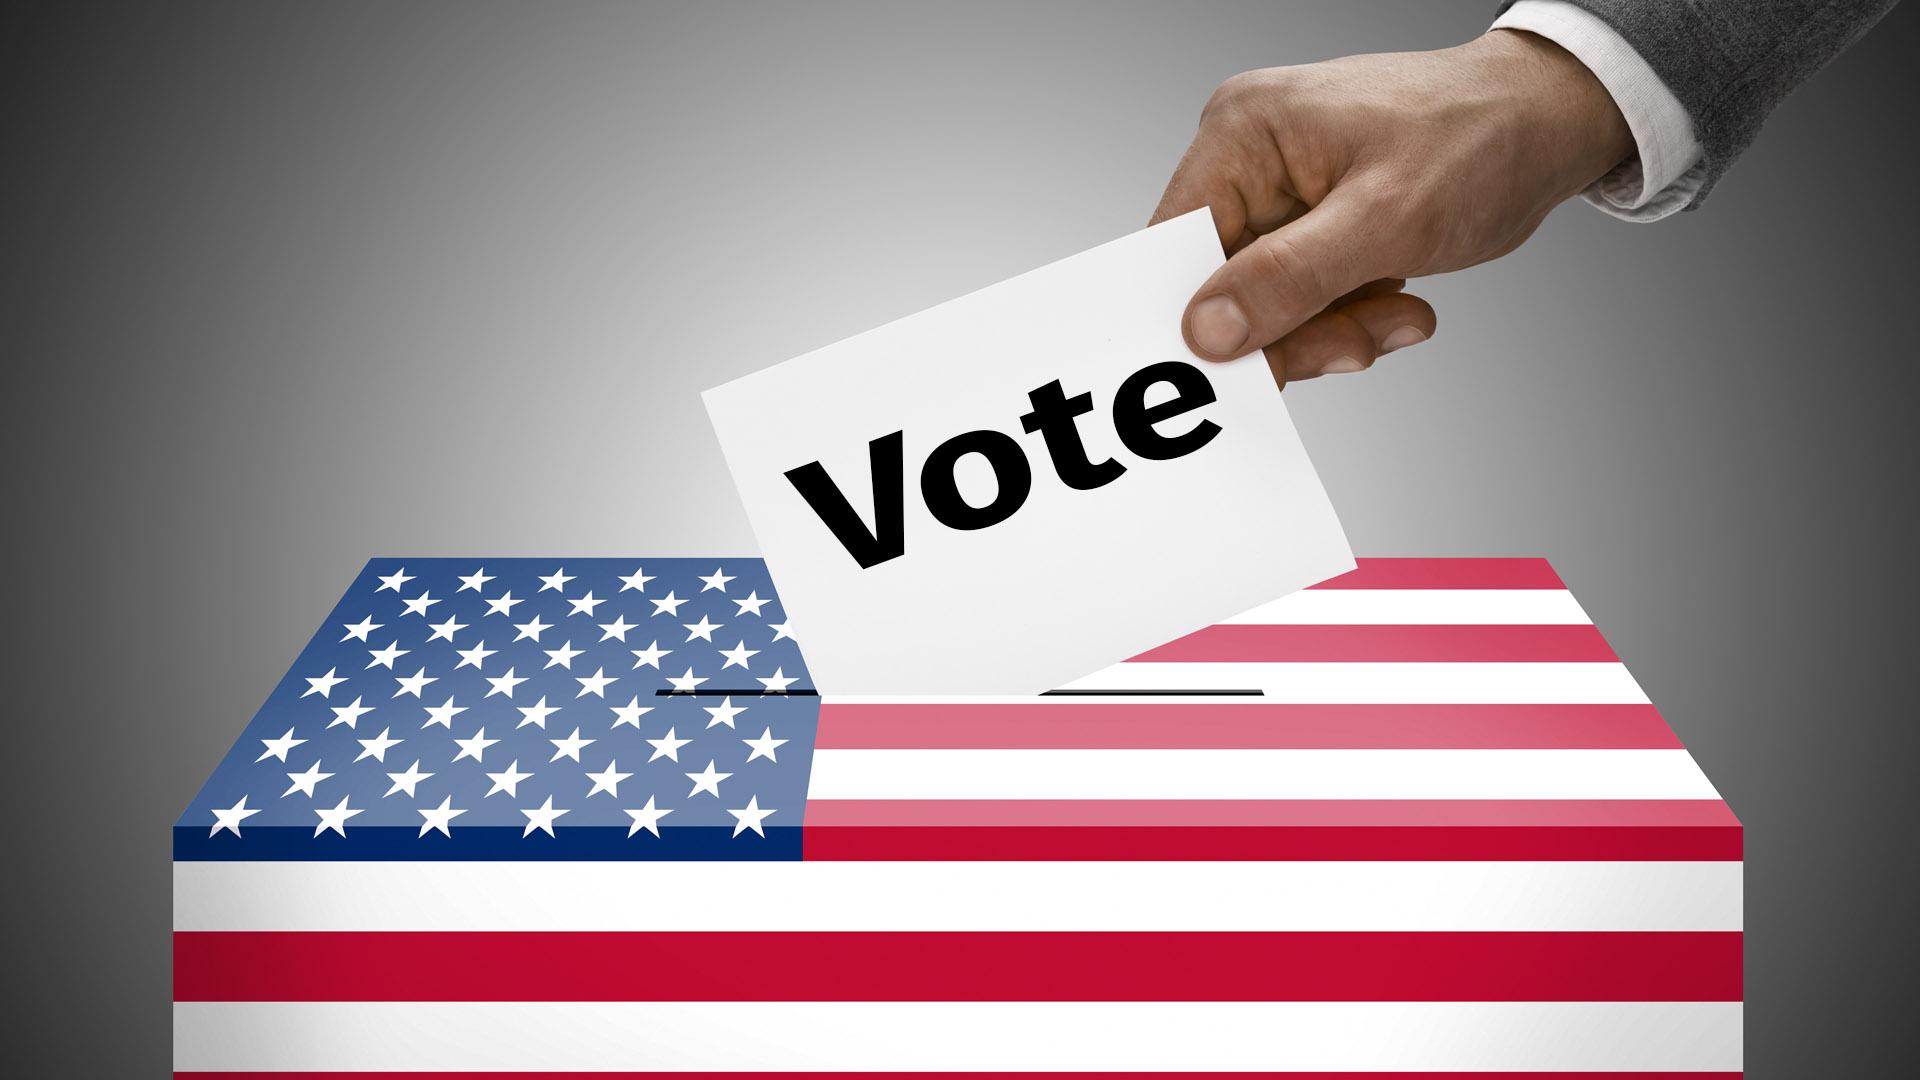 Photofocus urges everyone to vote today.